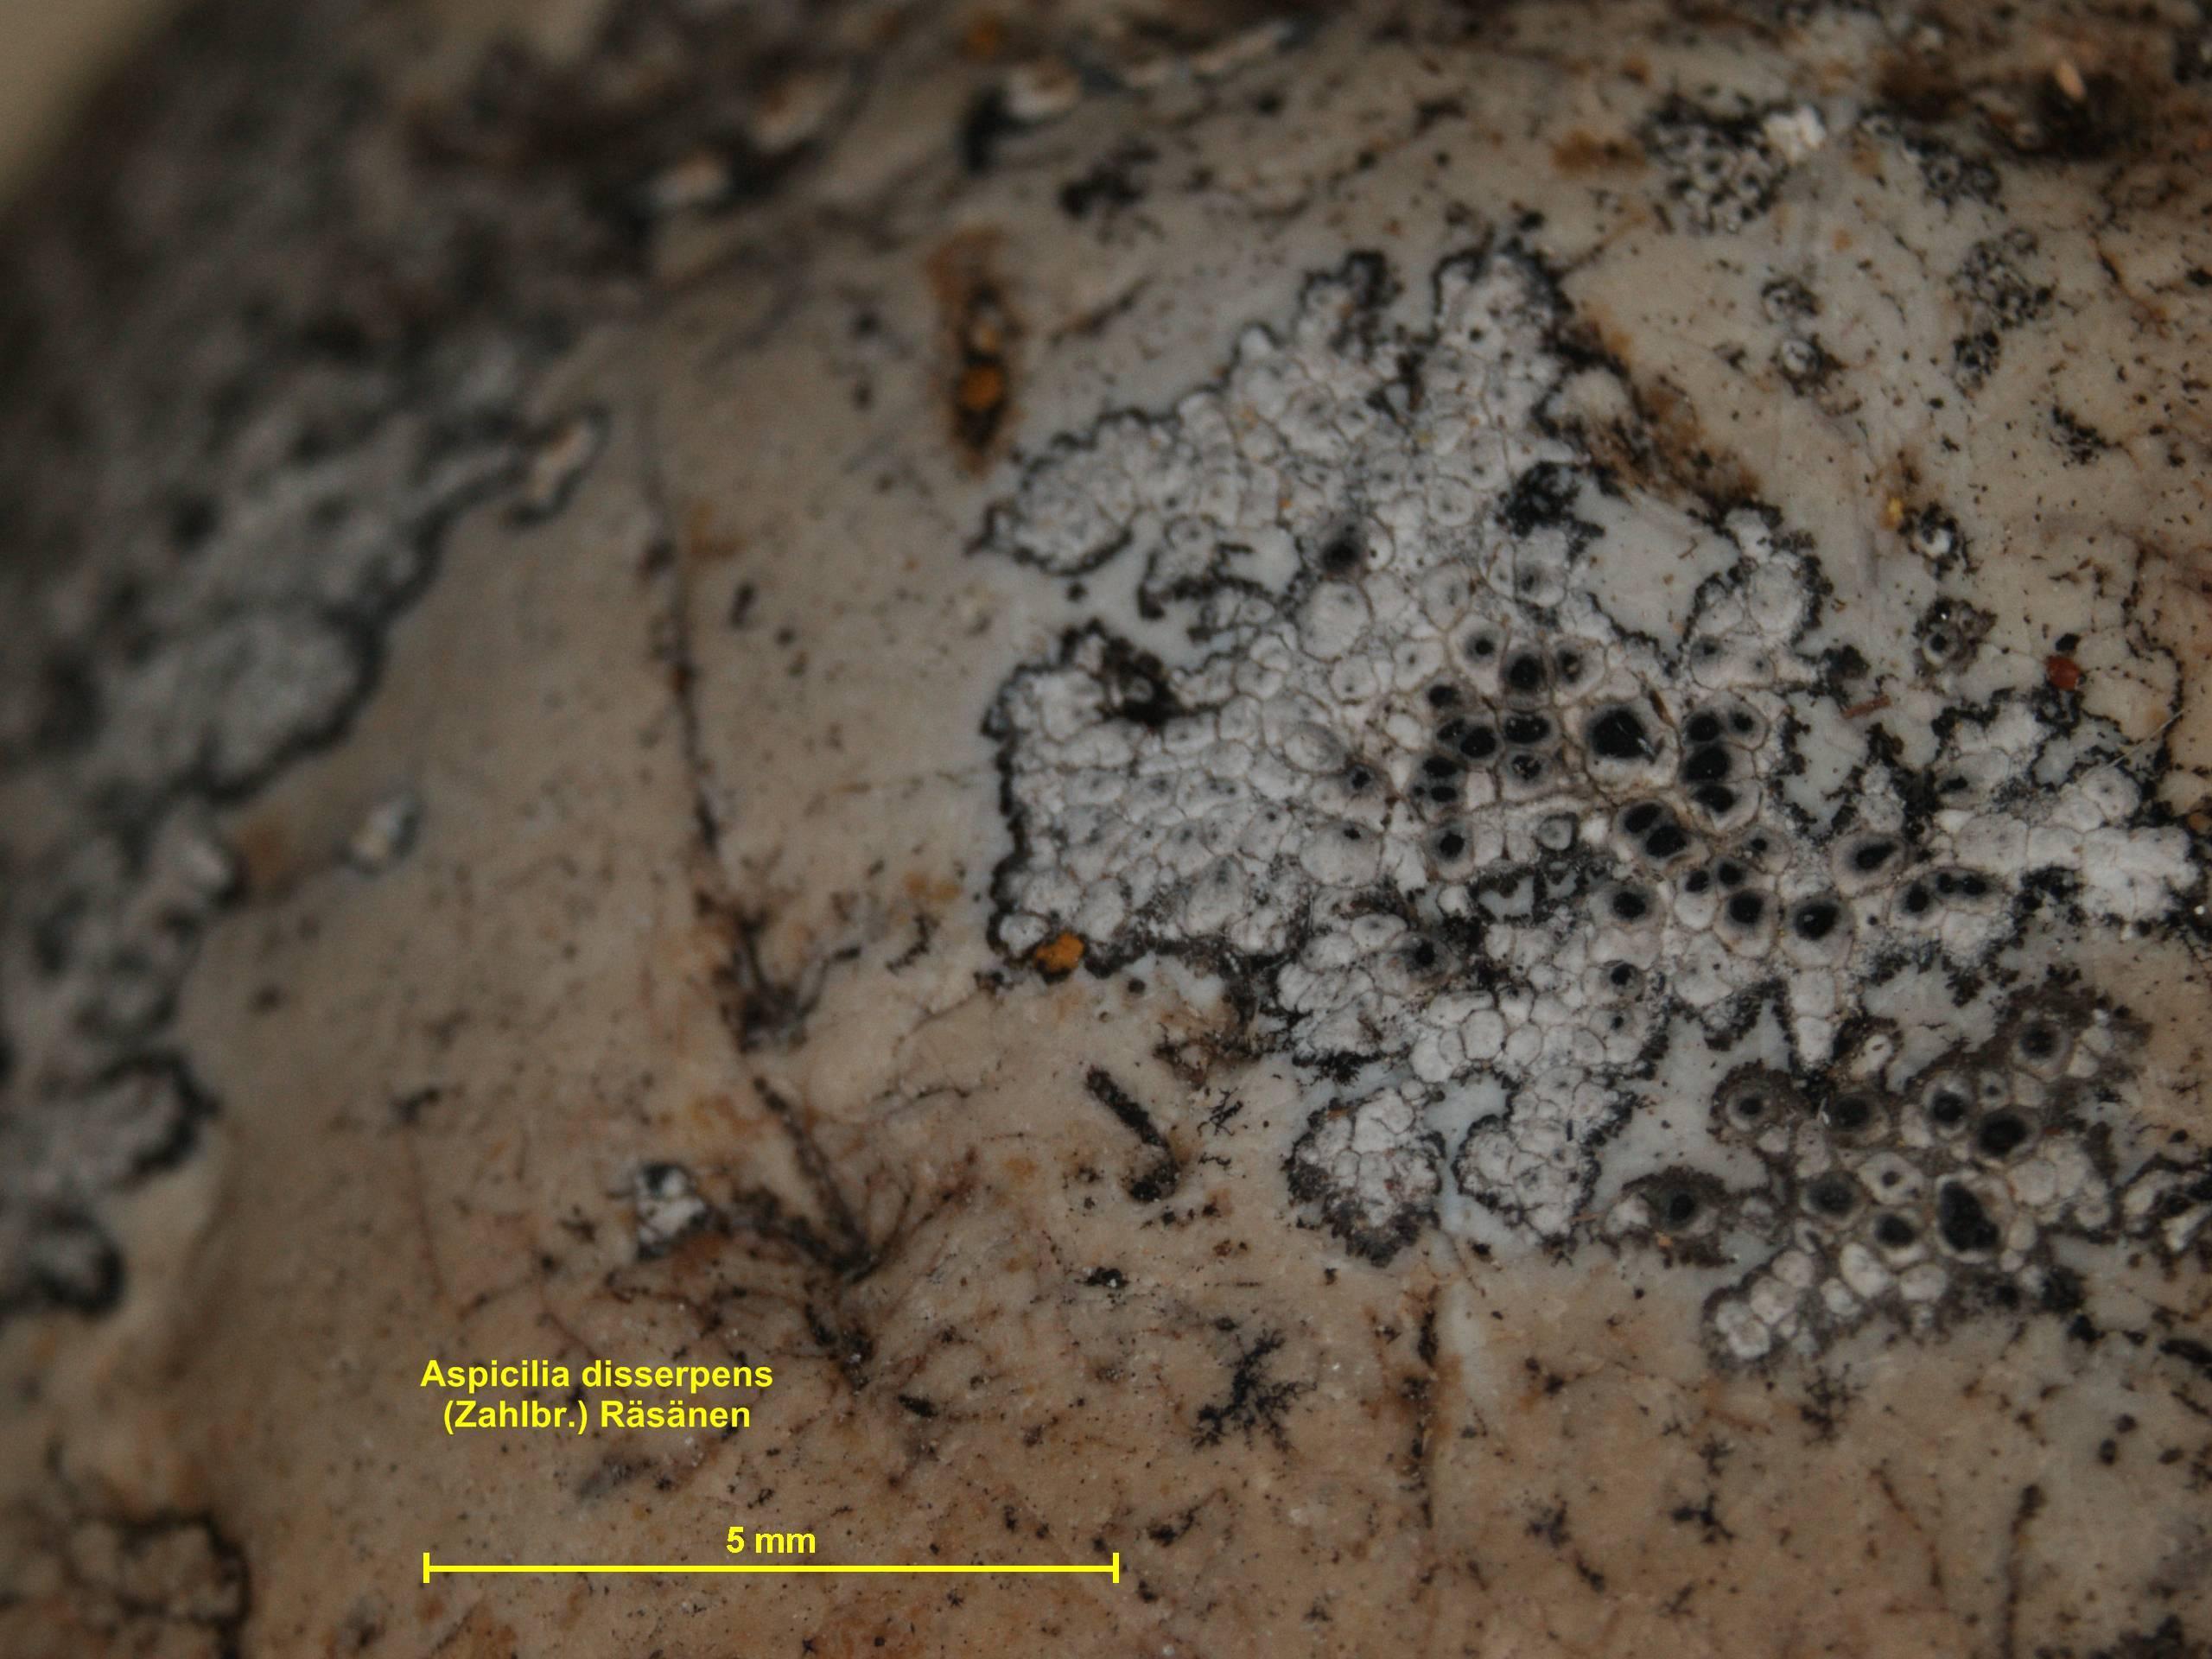 Image of rimmed lichen